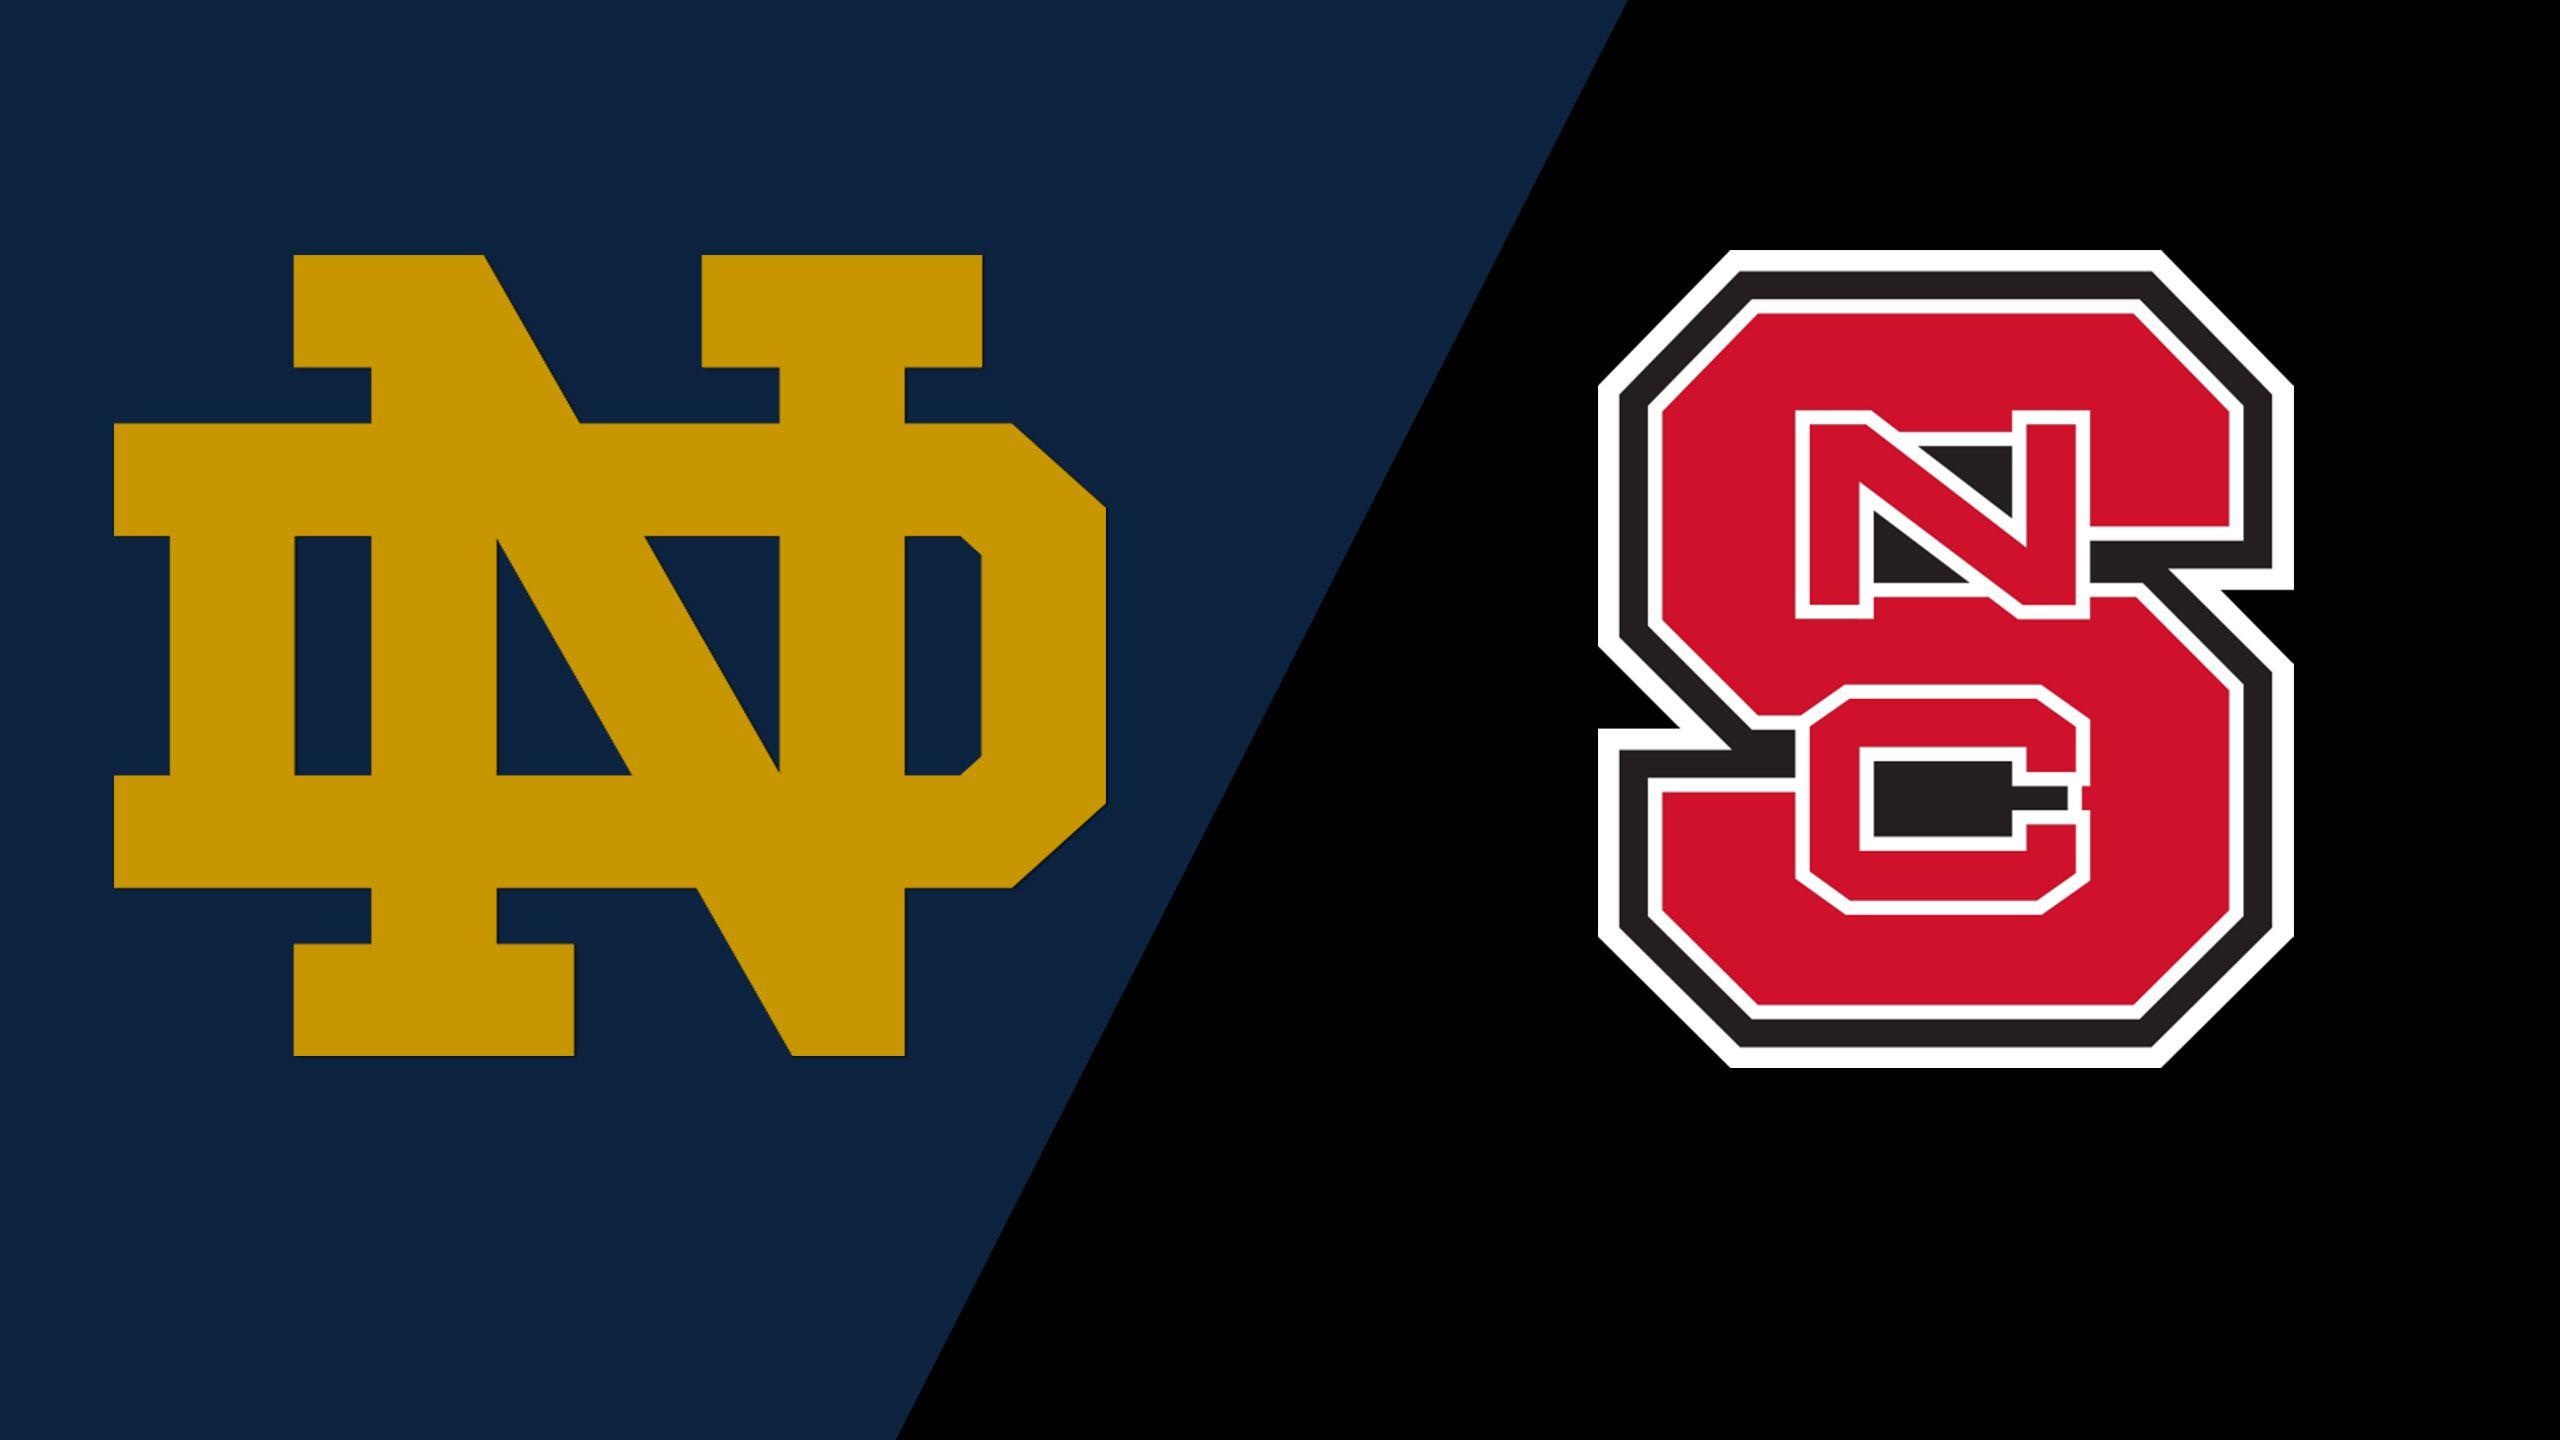 Notre Dame vs. #6 NC State (Baseball)